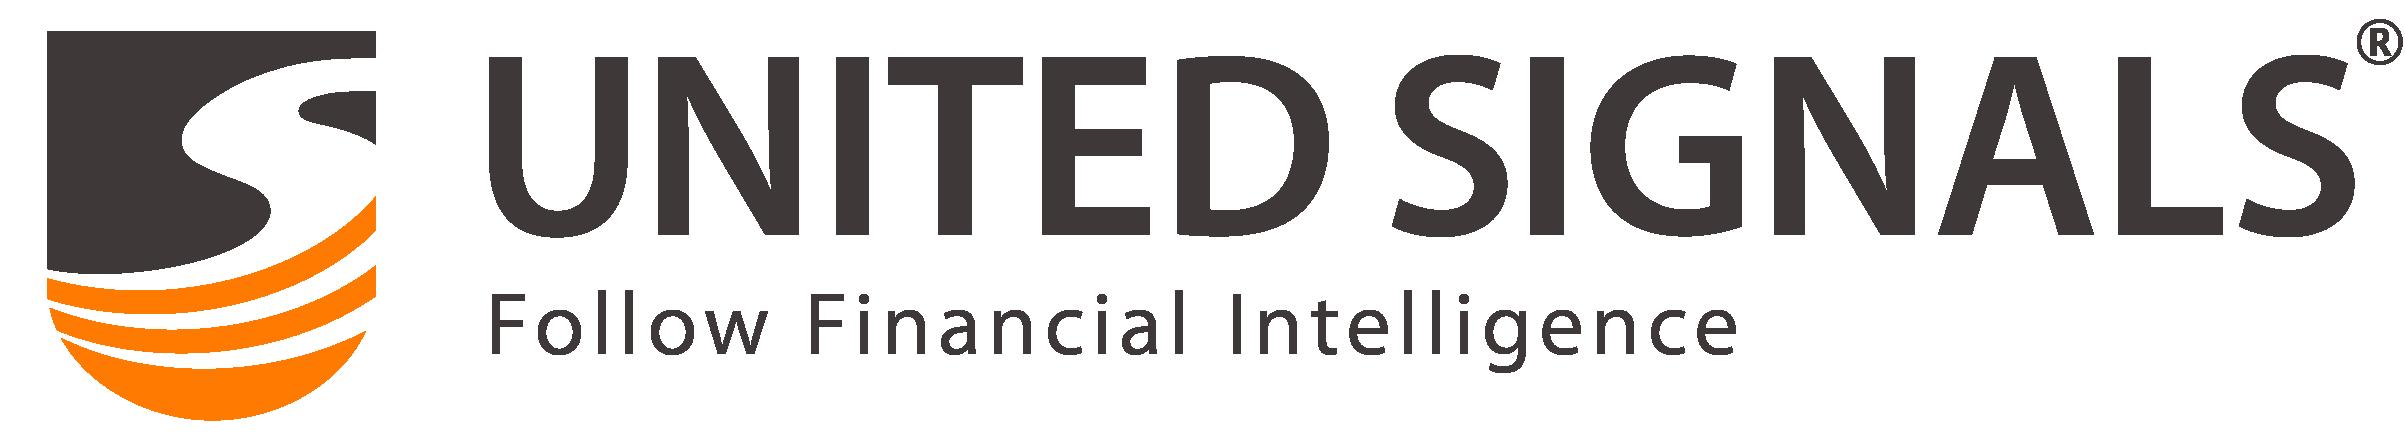 UnitedSignals-anbieter